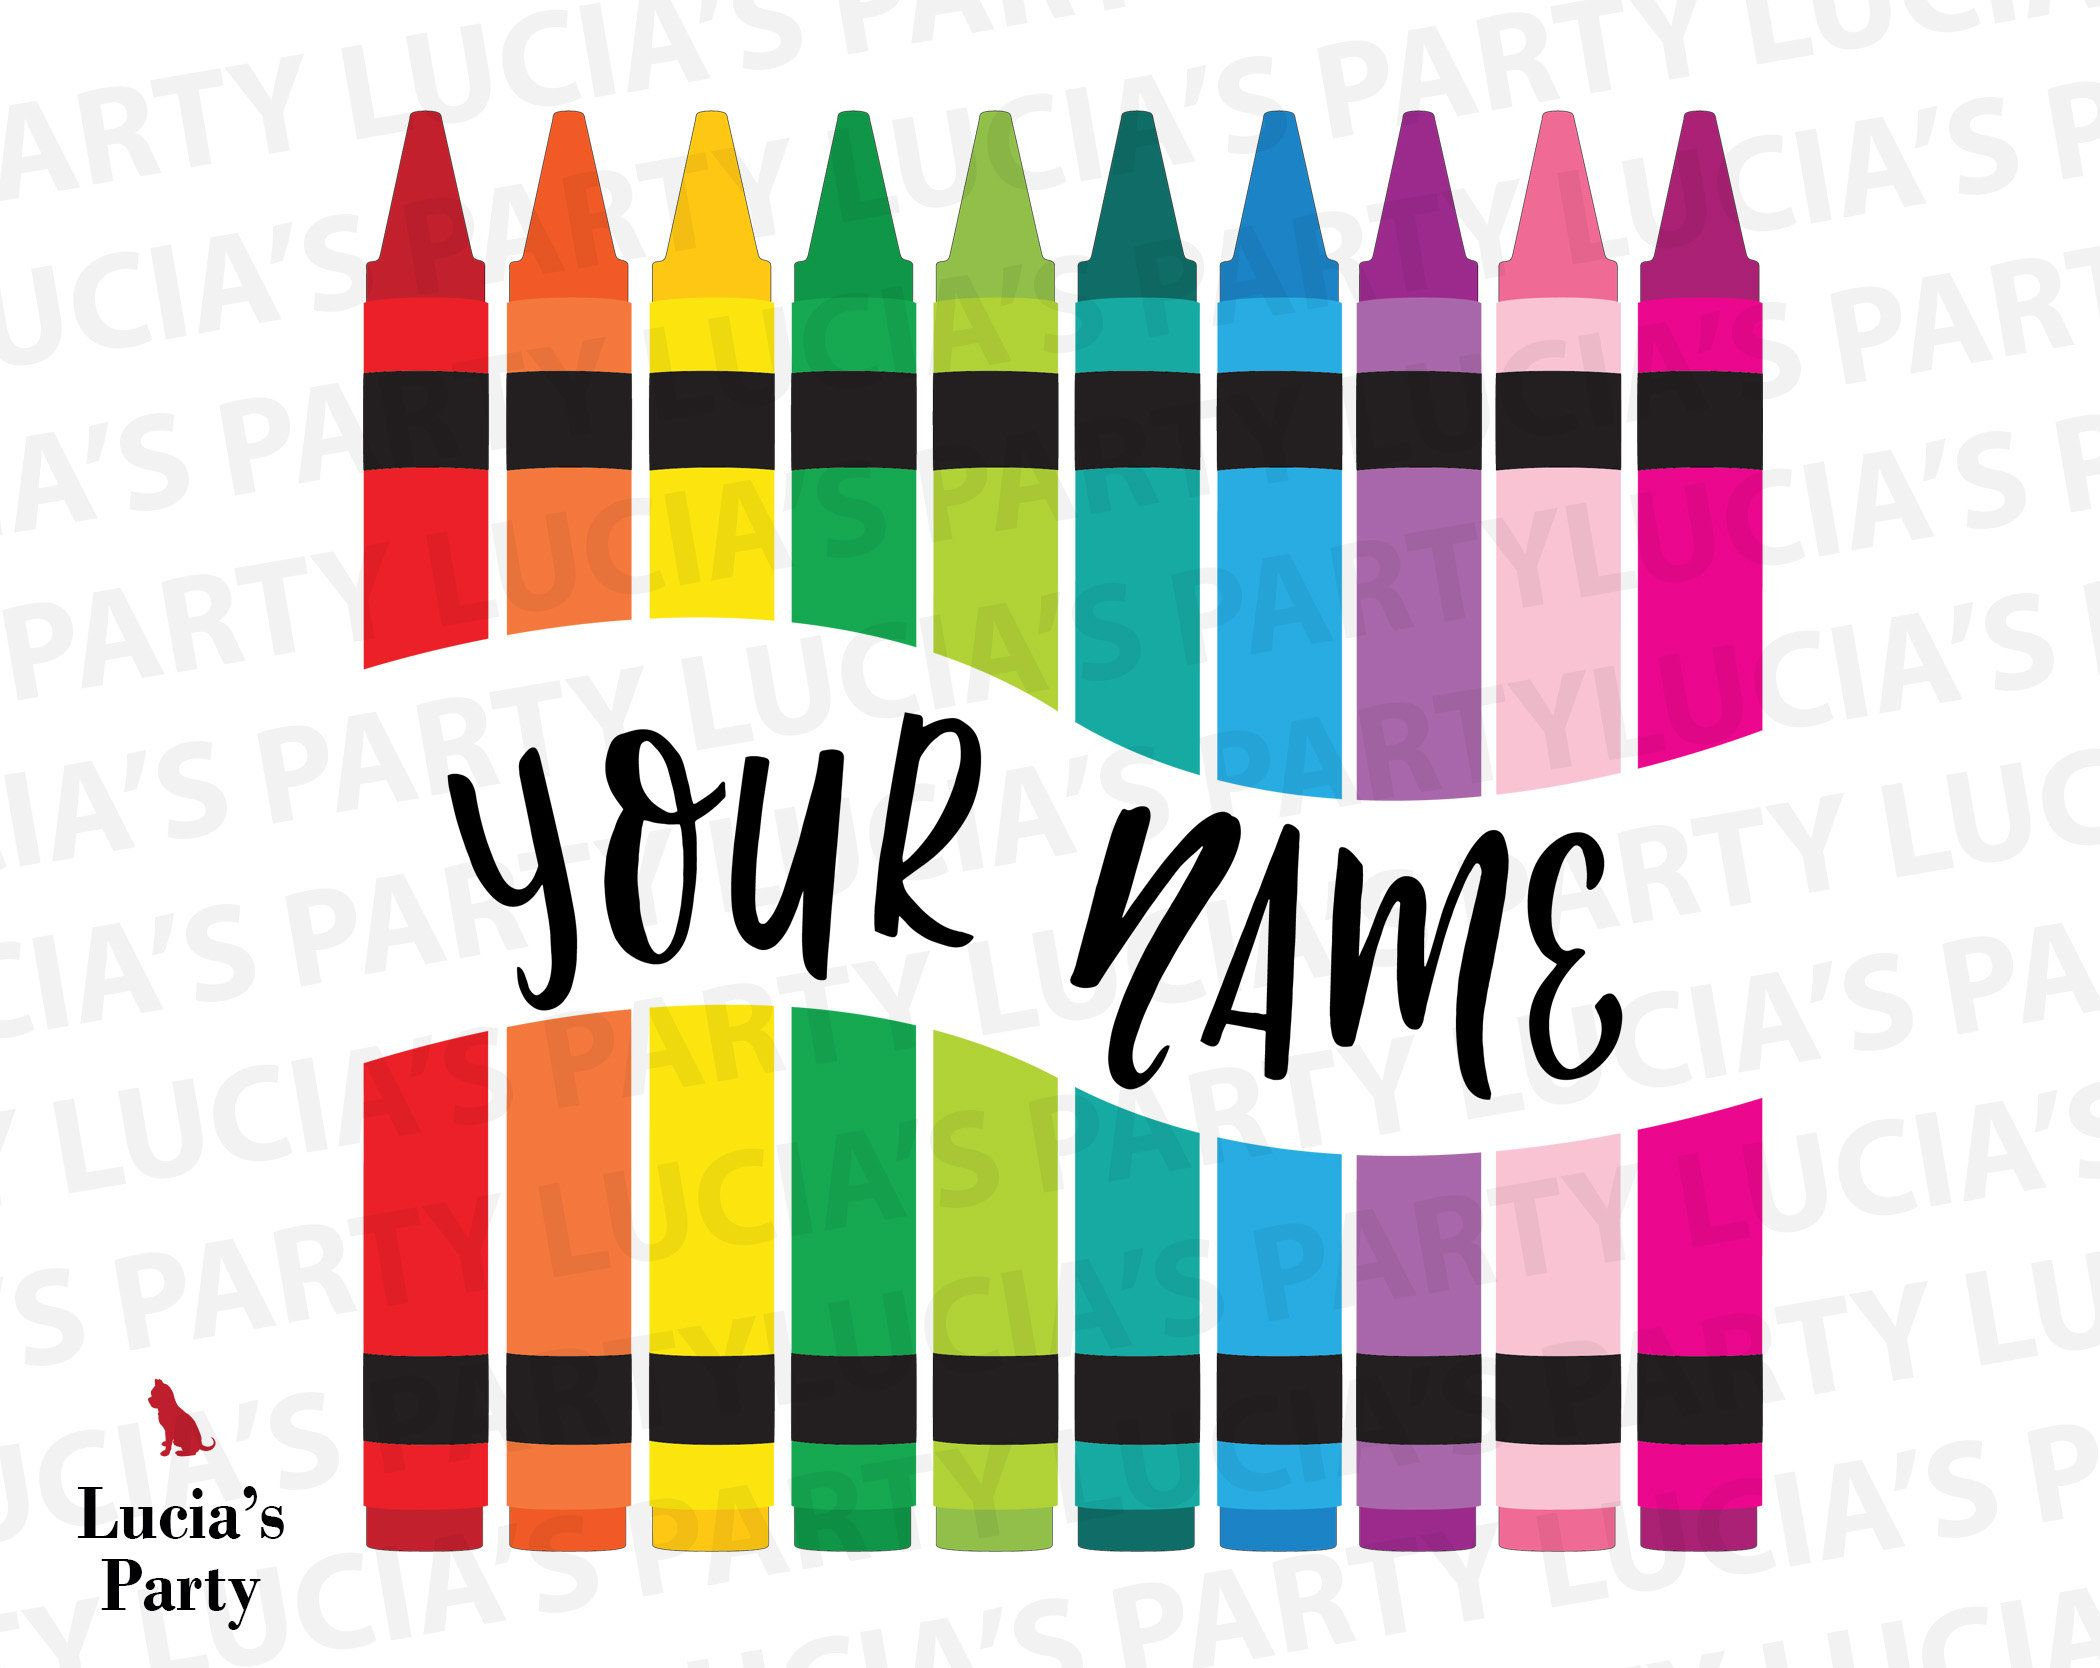 Crayon Split Svg Crayons Svg Crayon Split Monogram Svg Crayon Split For Name Split Crayon Png Split Crayon Svg Svg Png Dxf Jpg In 2020 Monogram Svg Crayon Monogram Crayon